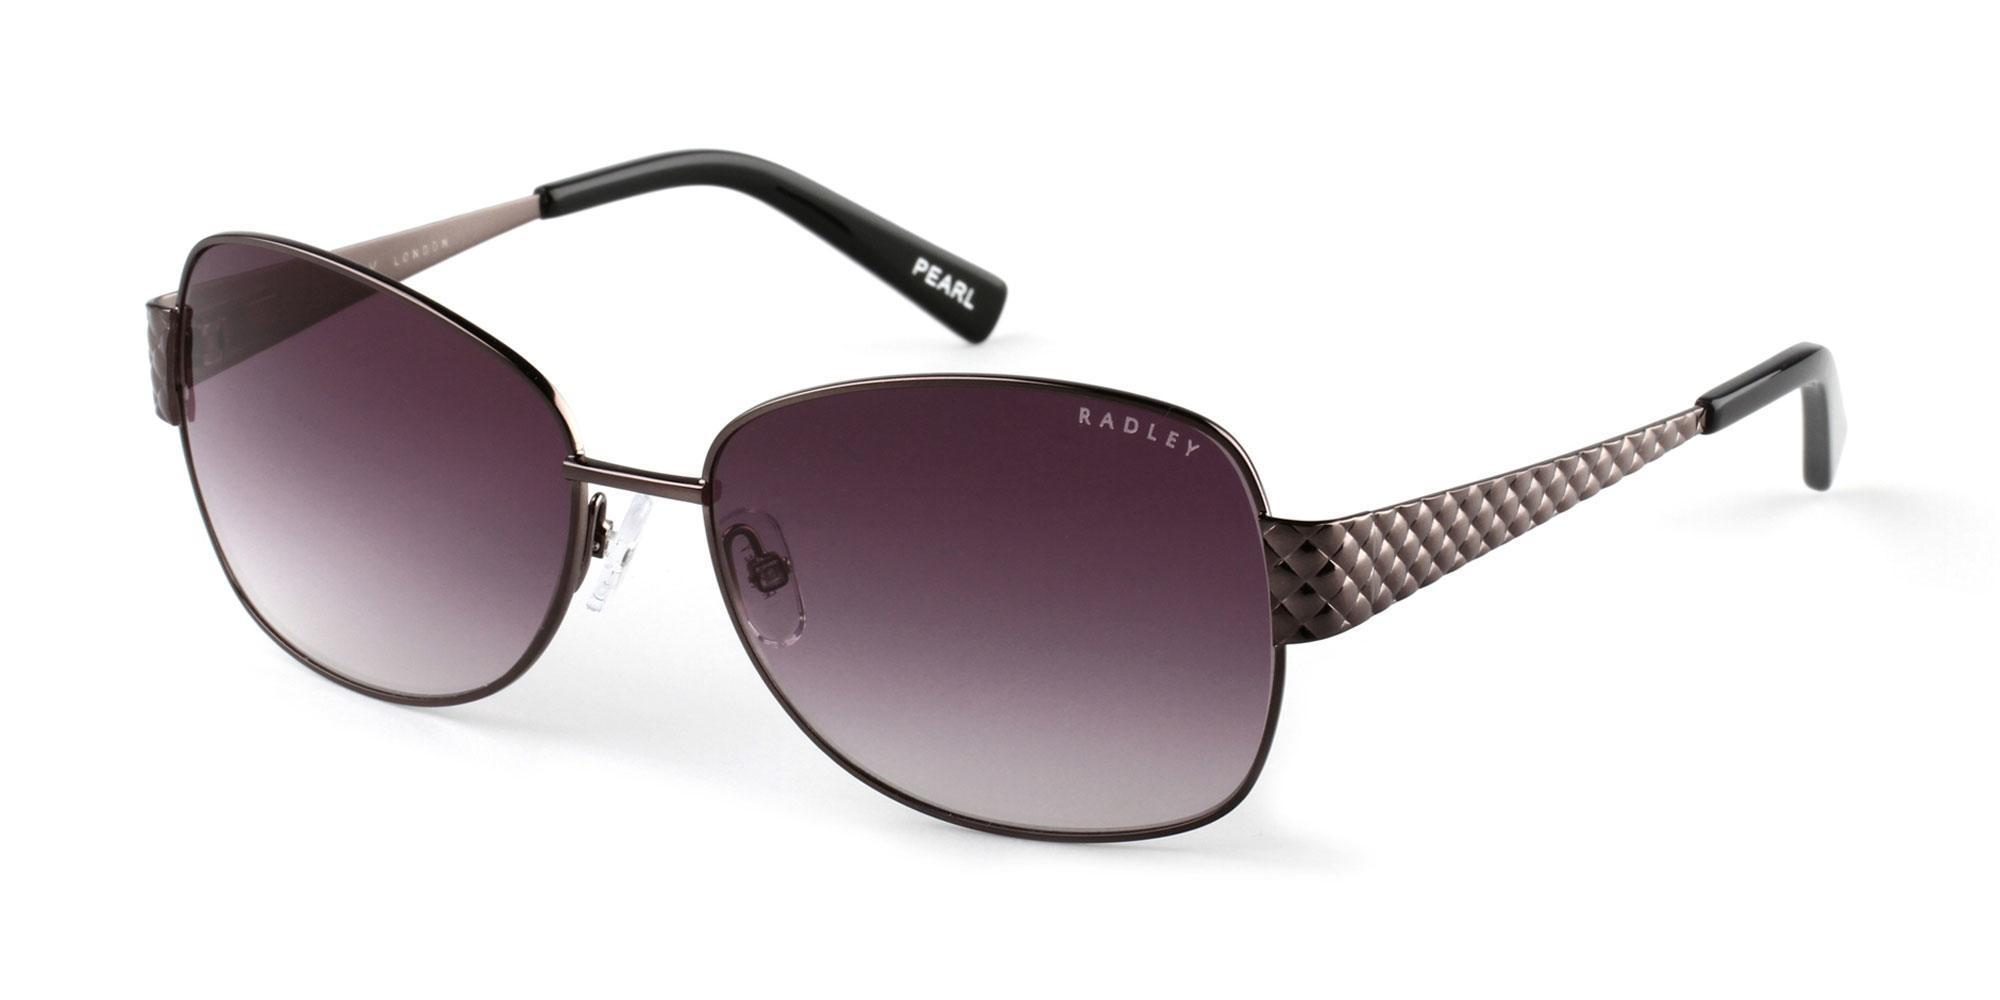 205 RDS-PEARLE-RX Sunglasses, Radley London